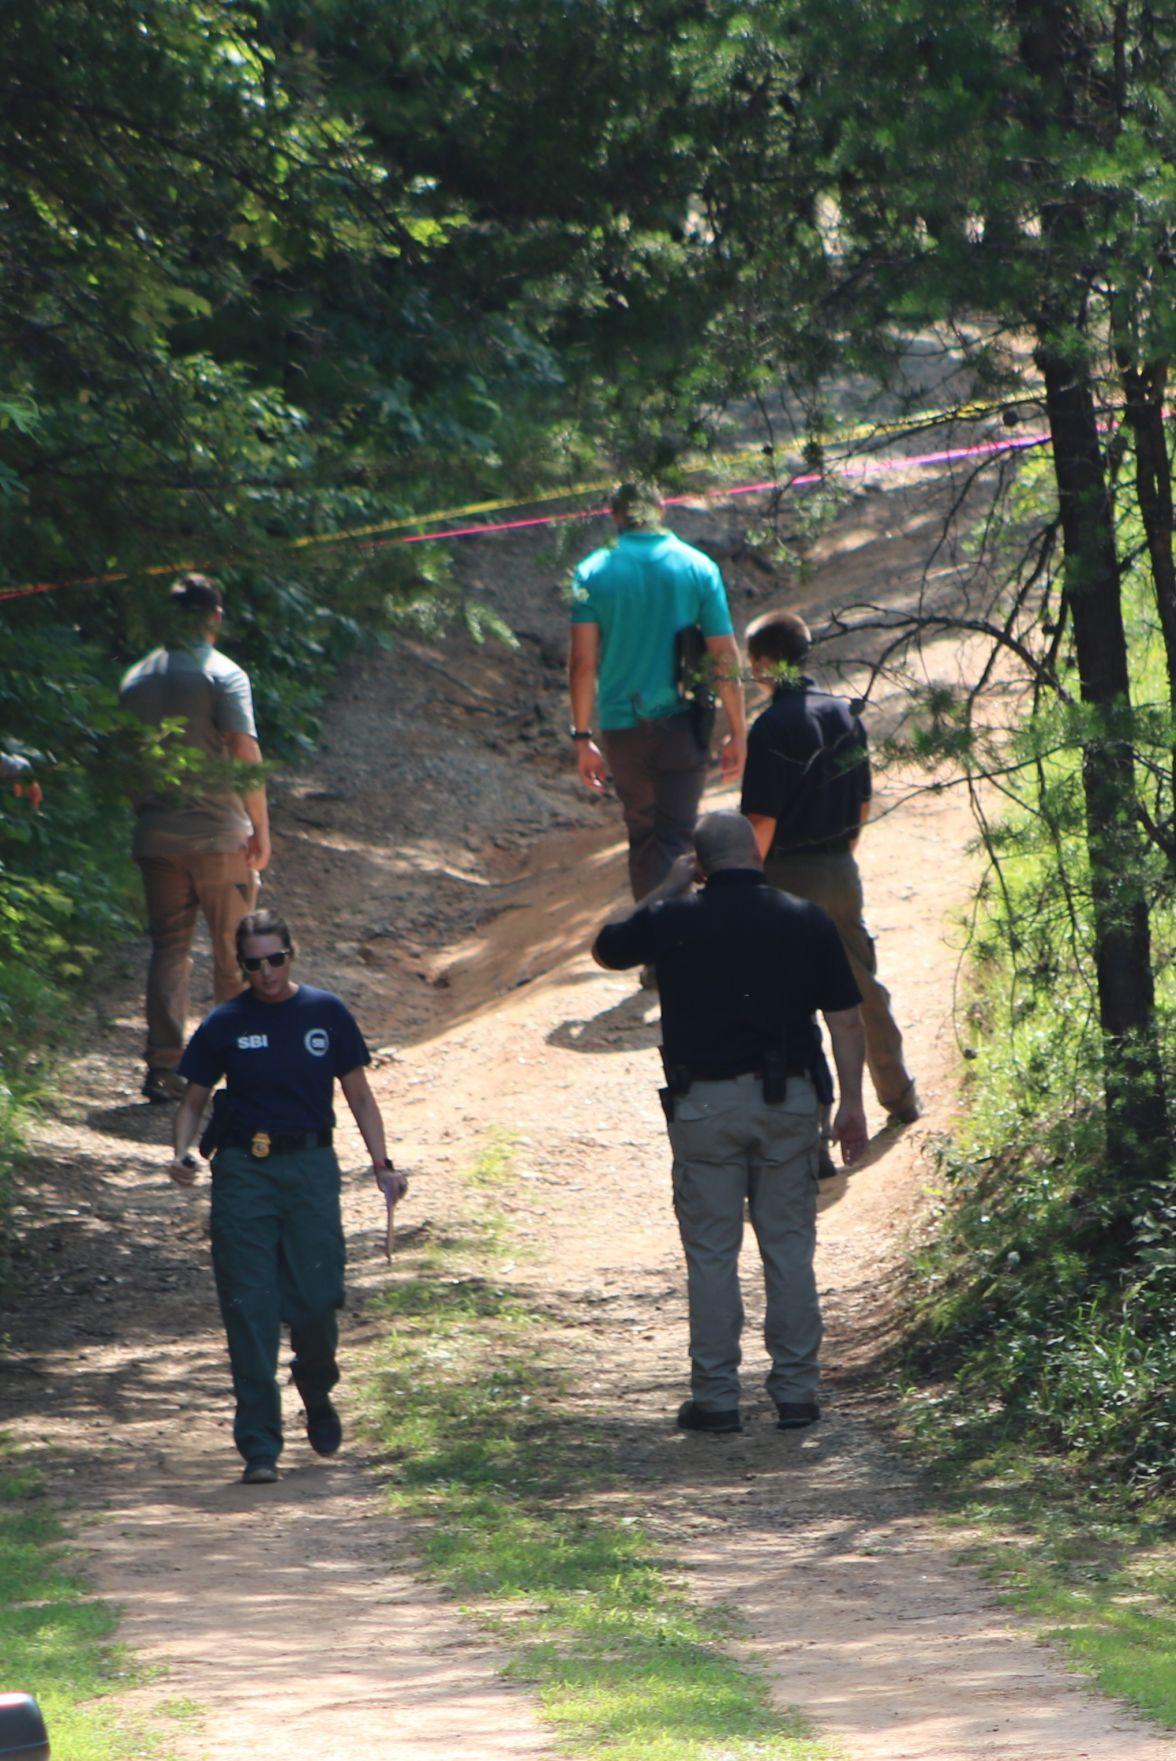 BREAKING: Three found dead at Morganton home | News